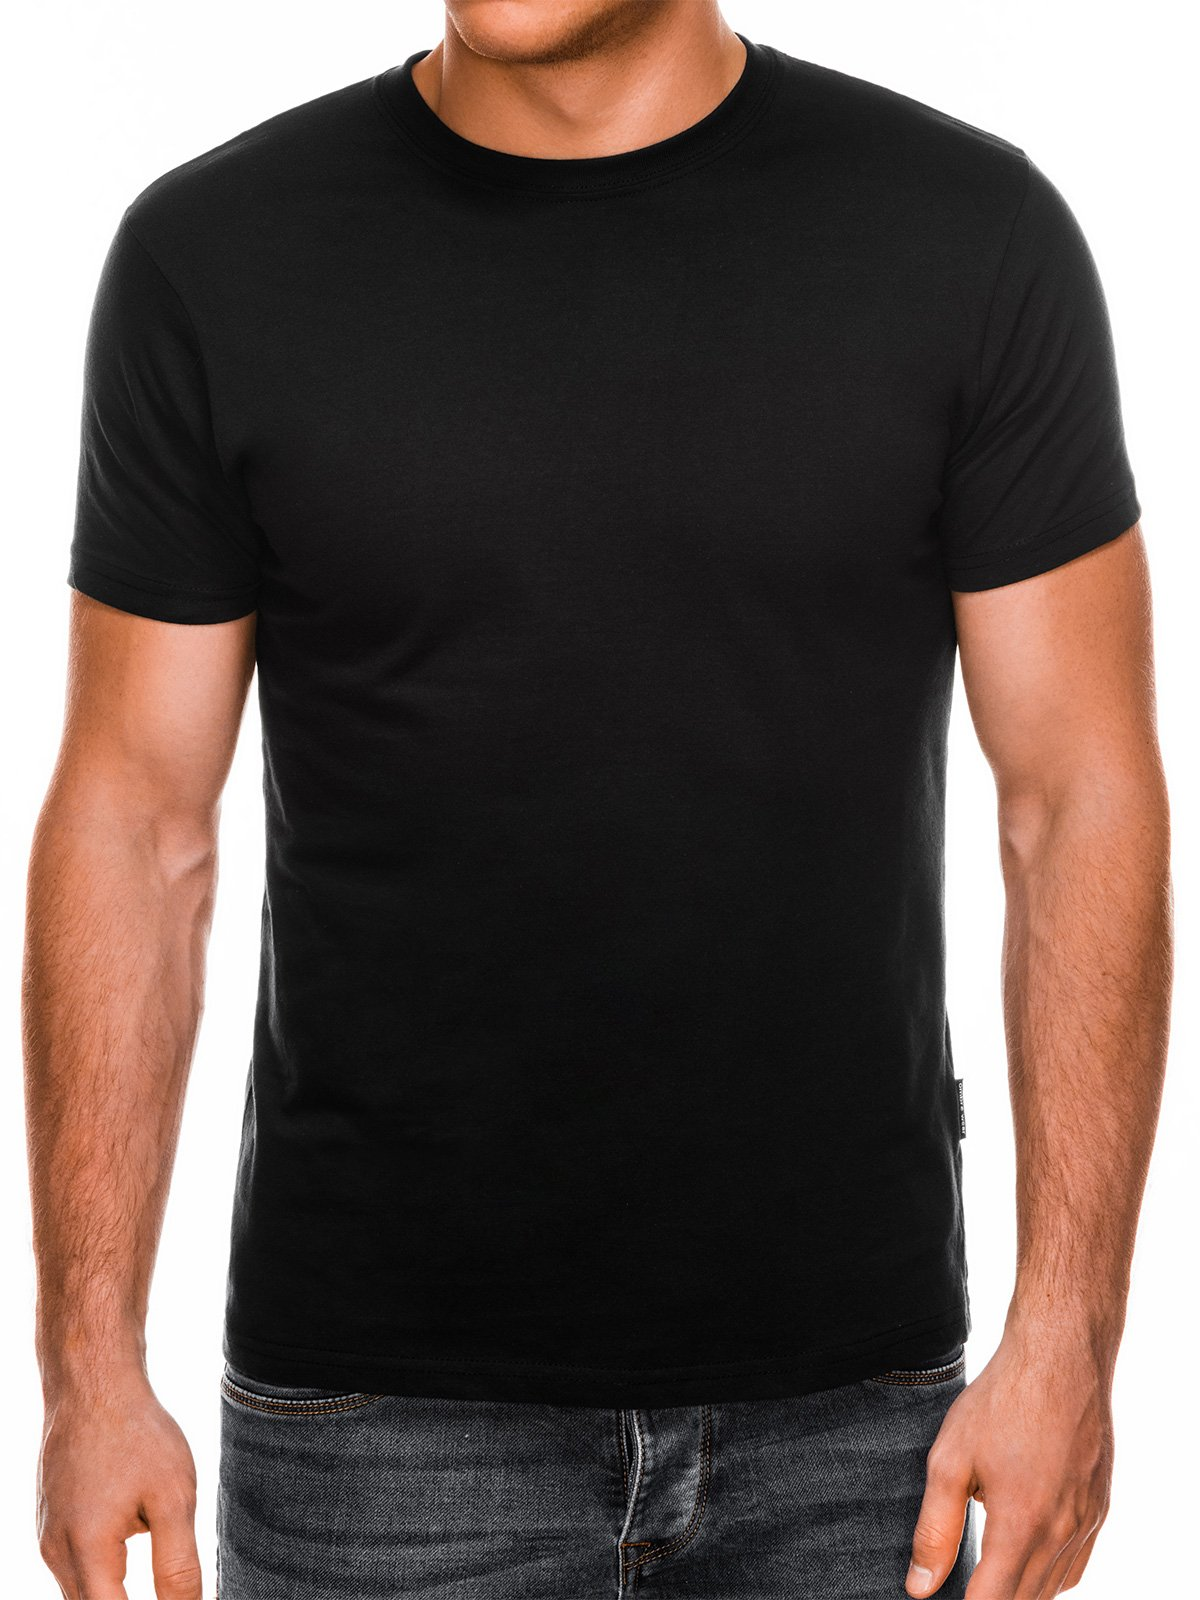 Футболка чоловіча без малюнка S884 - чорна